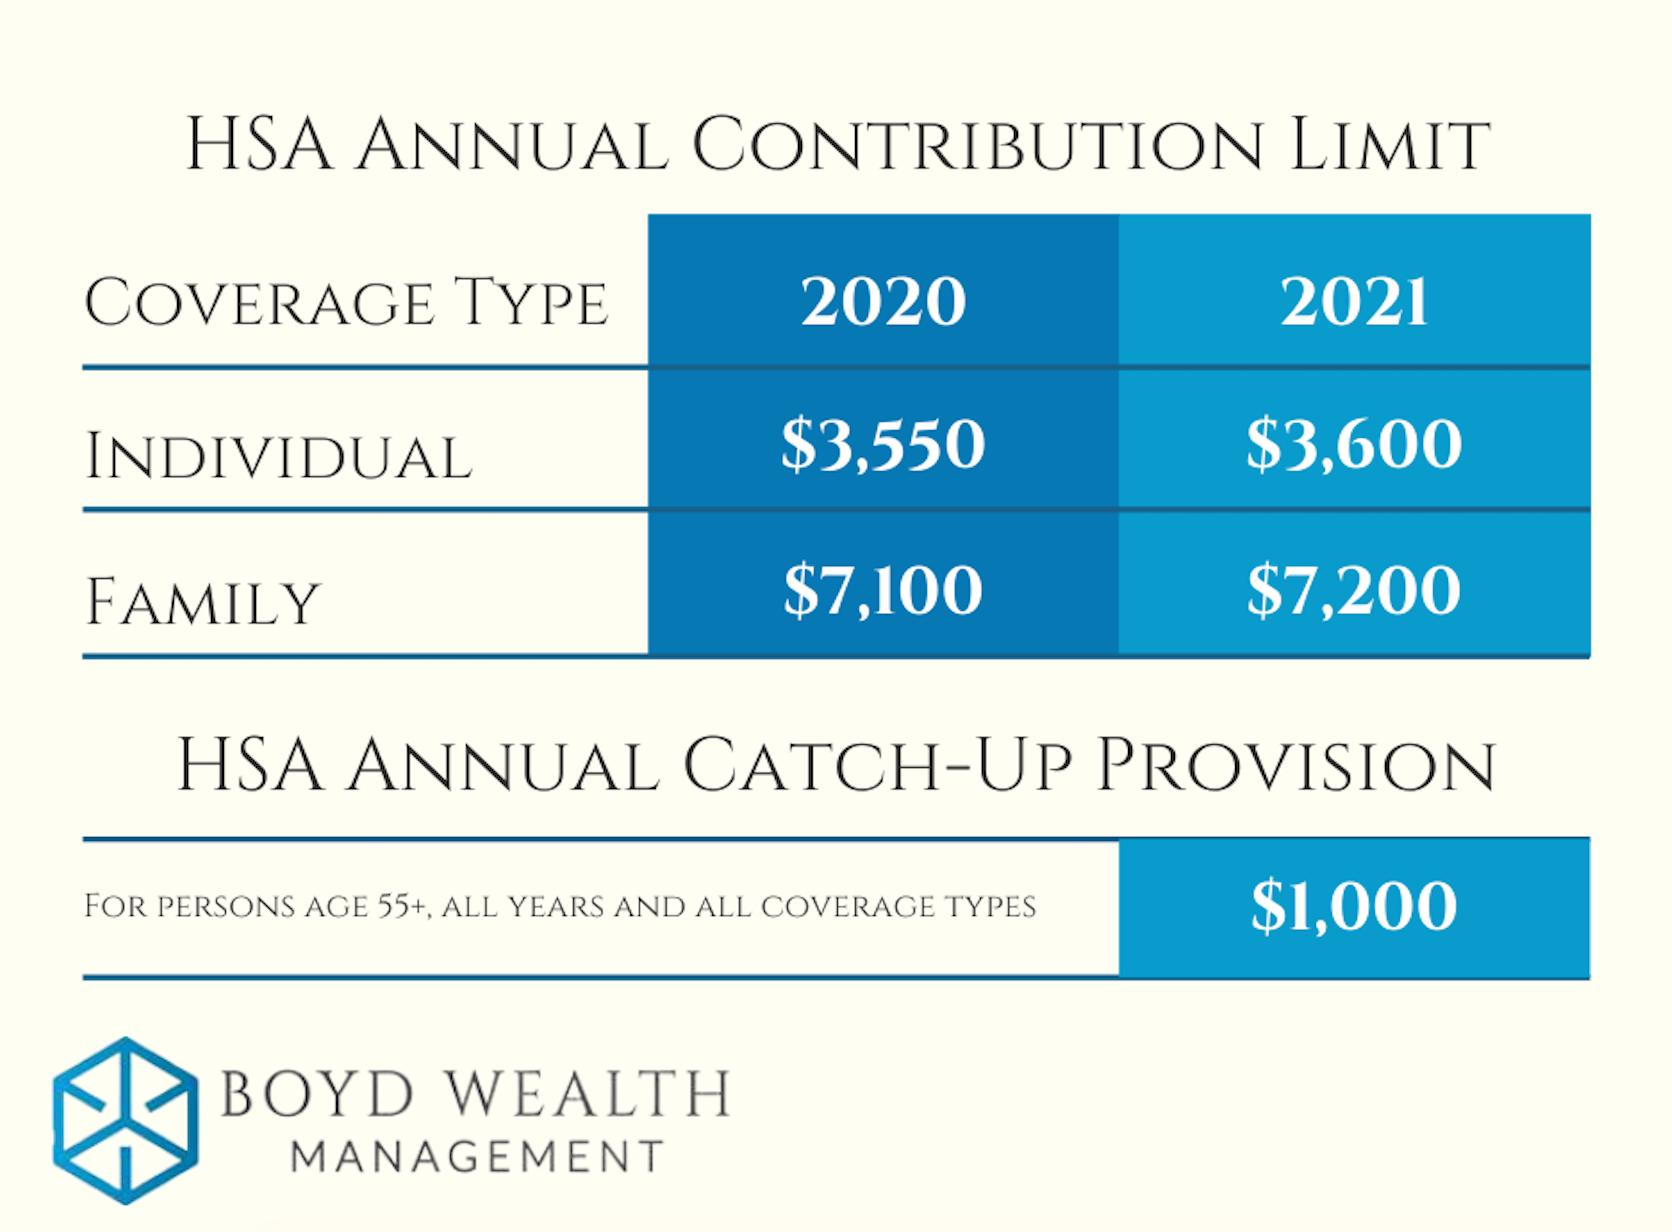 HSA Annual Contribution Limit